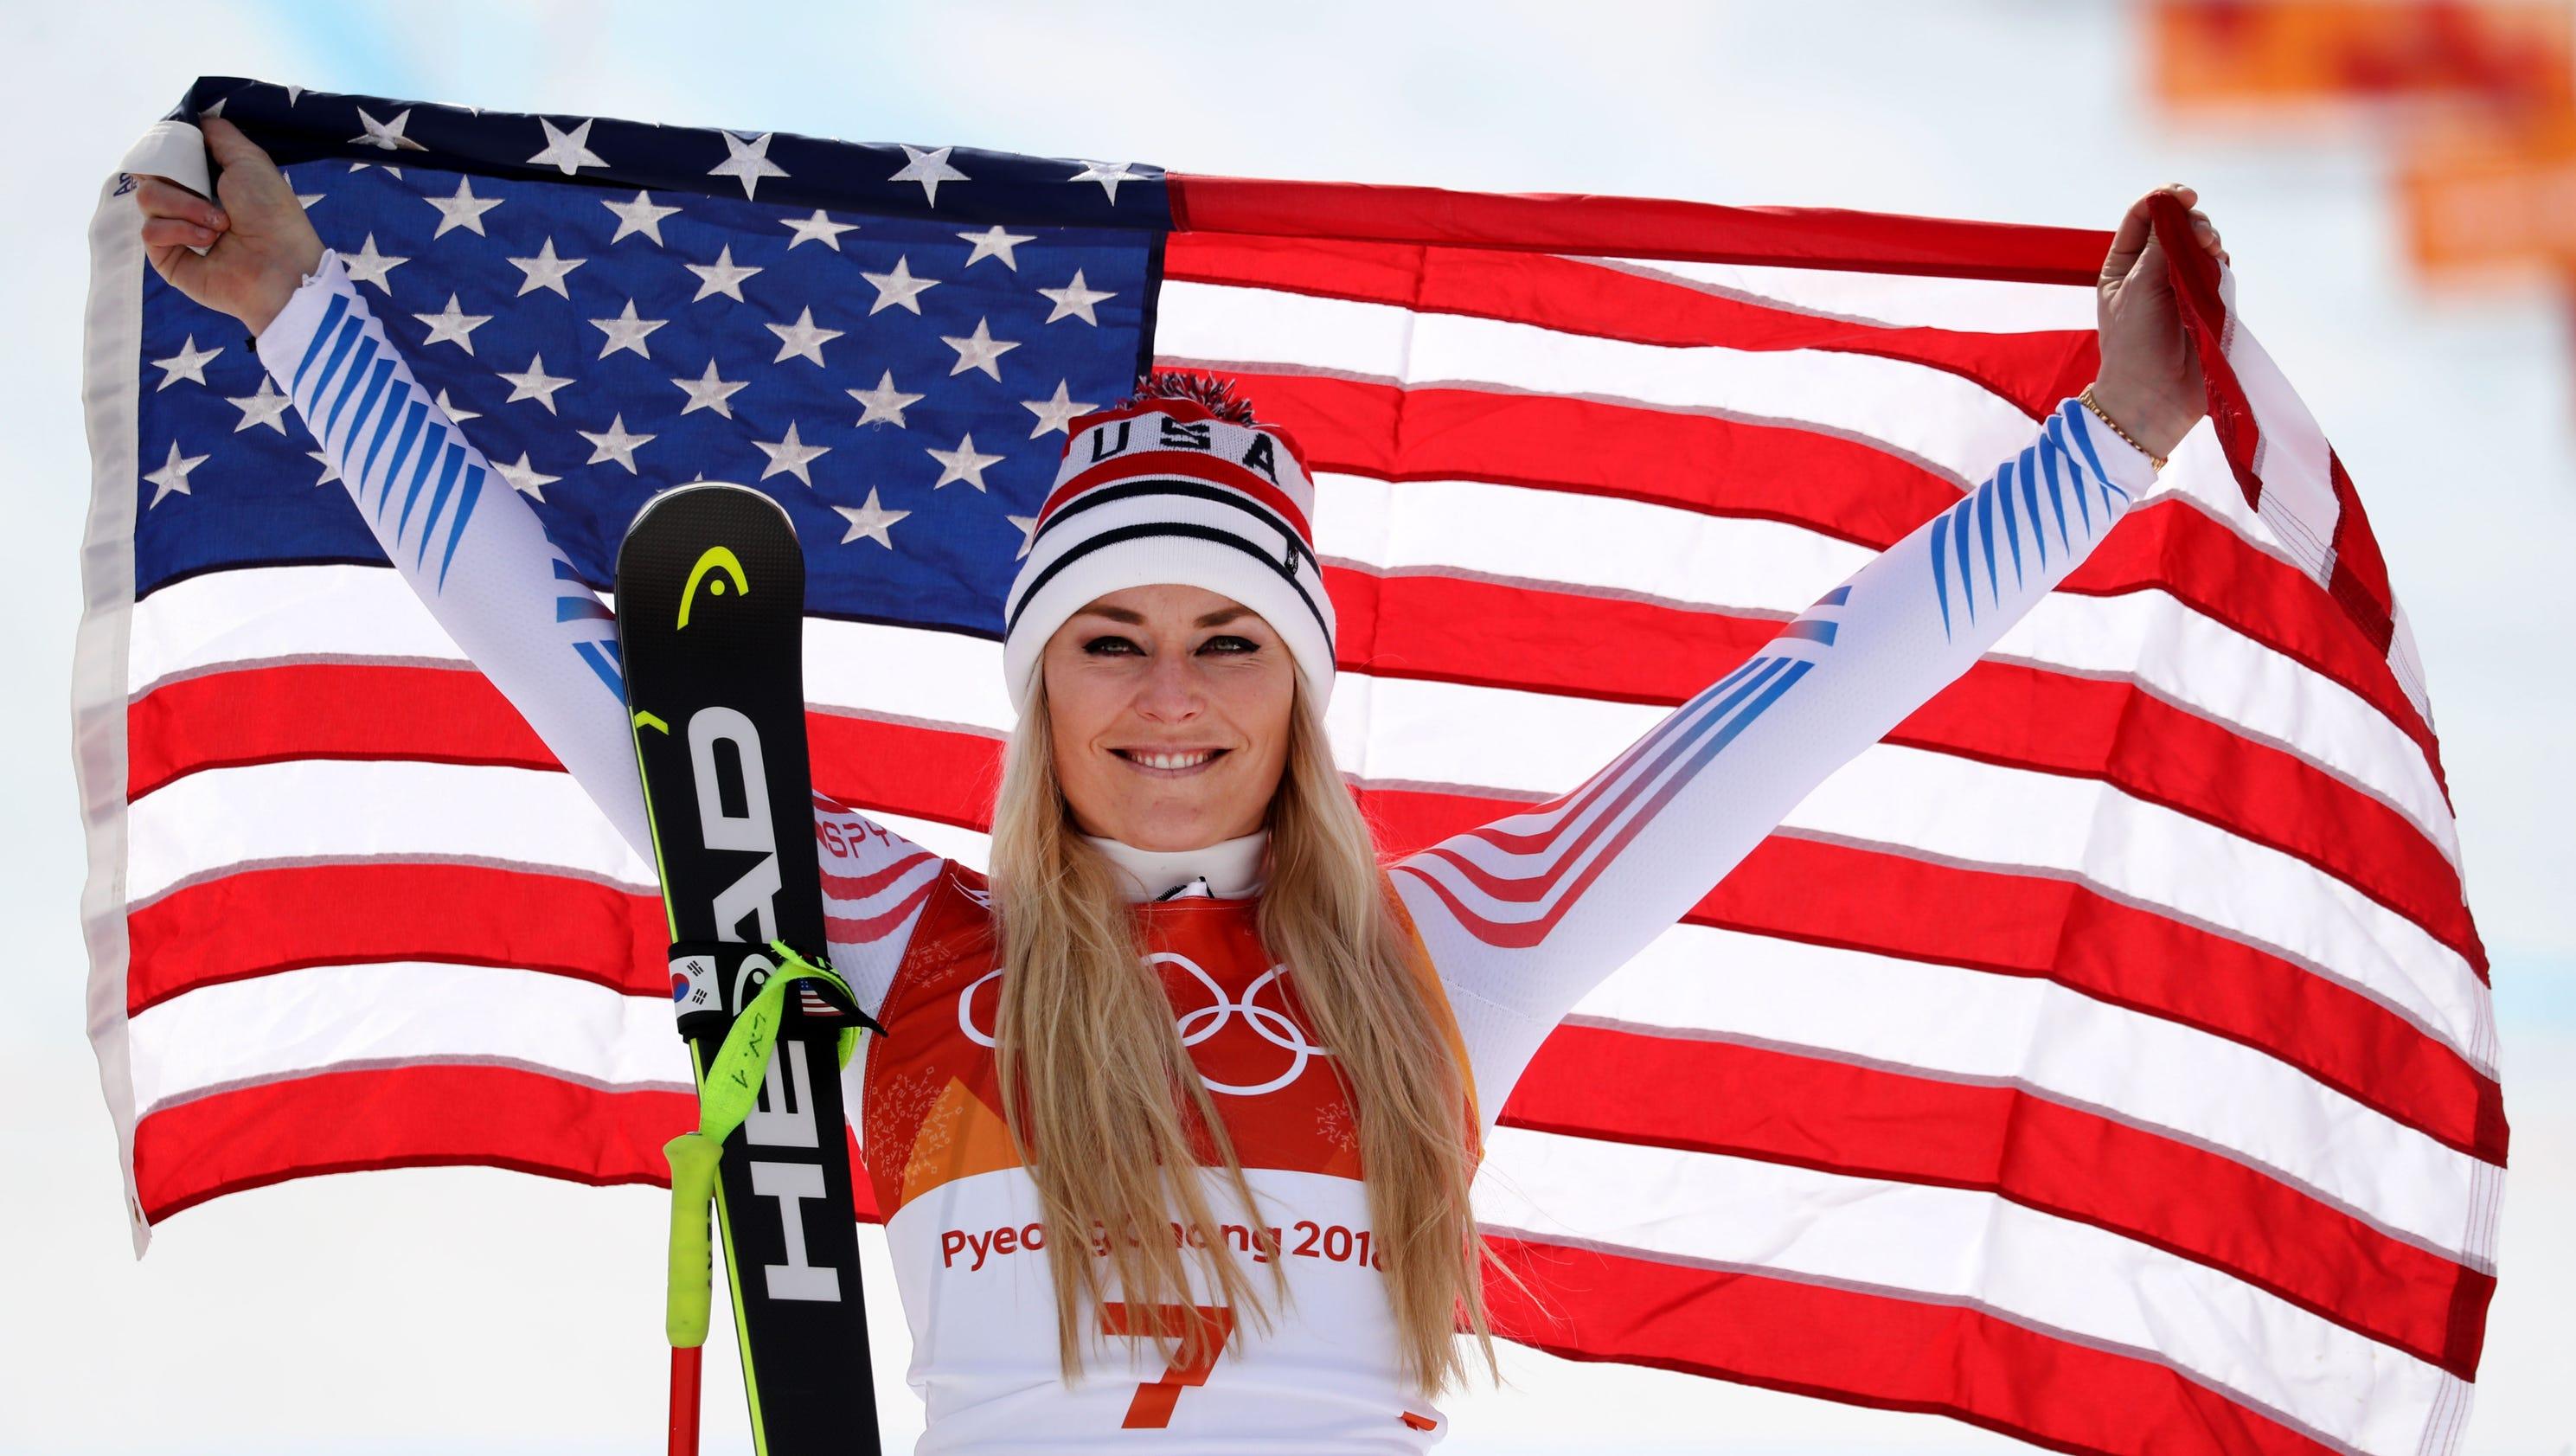 636547756865039895-usp-olympics-alpine-skiing-womens-downhill-97755425